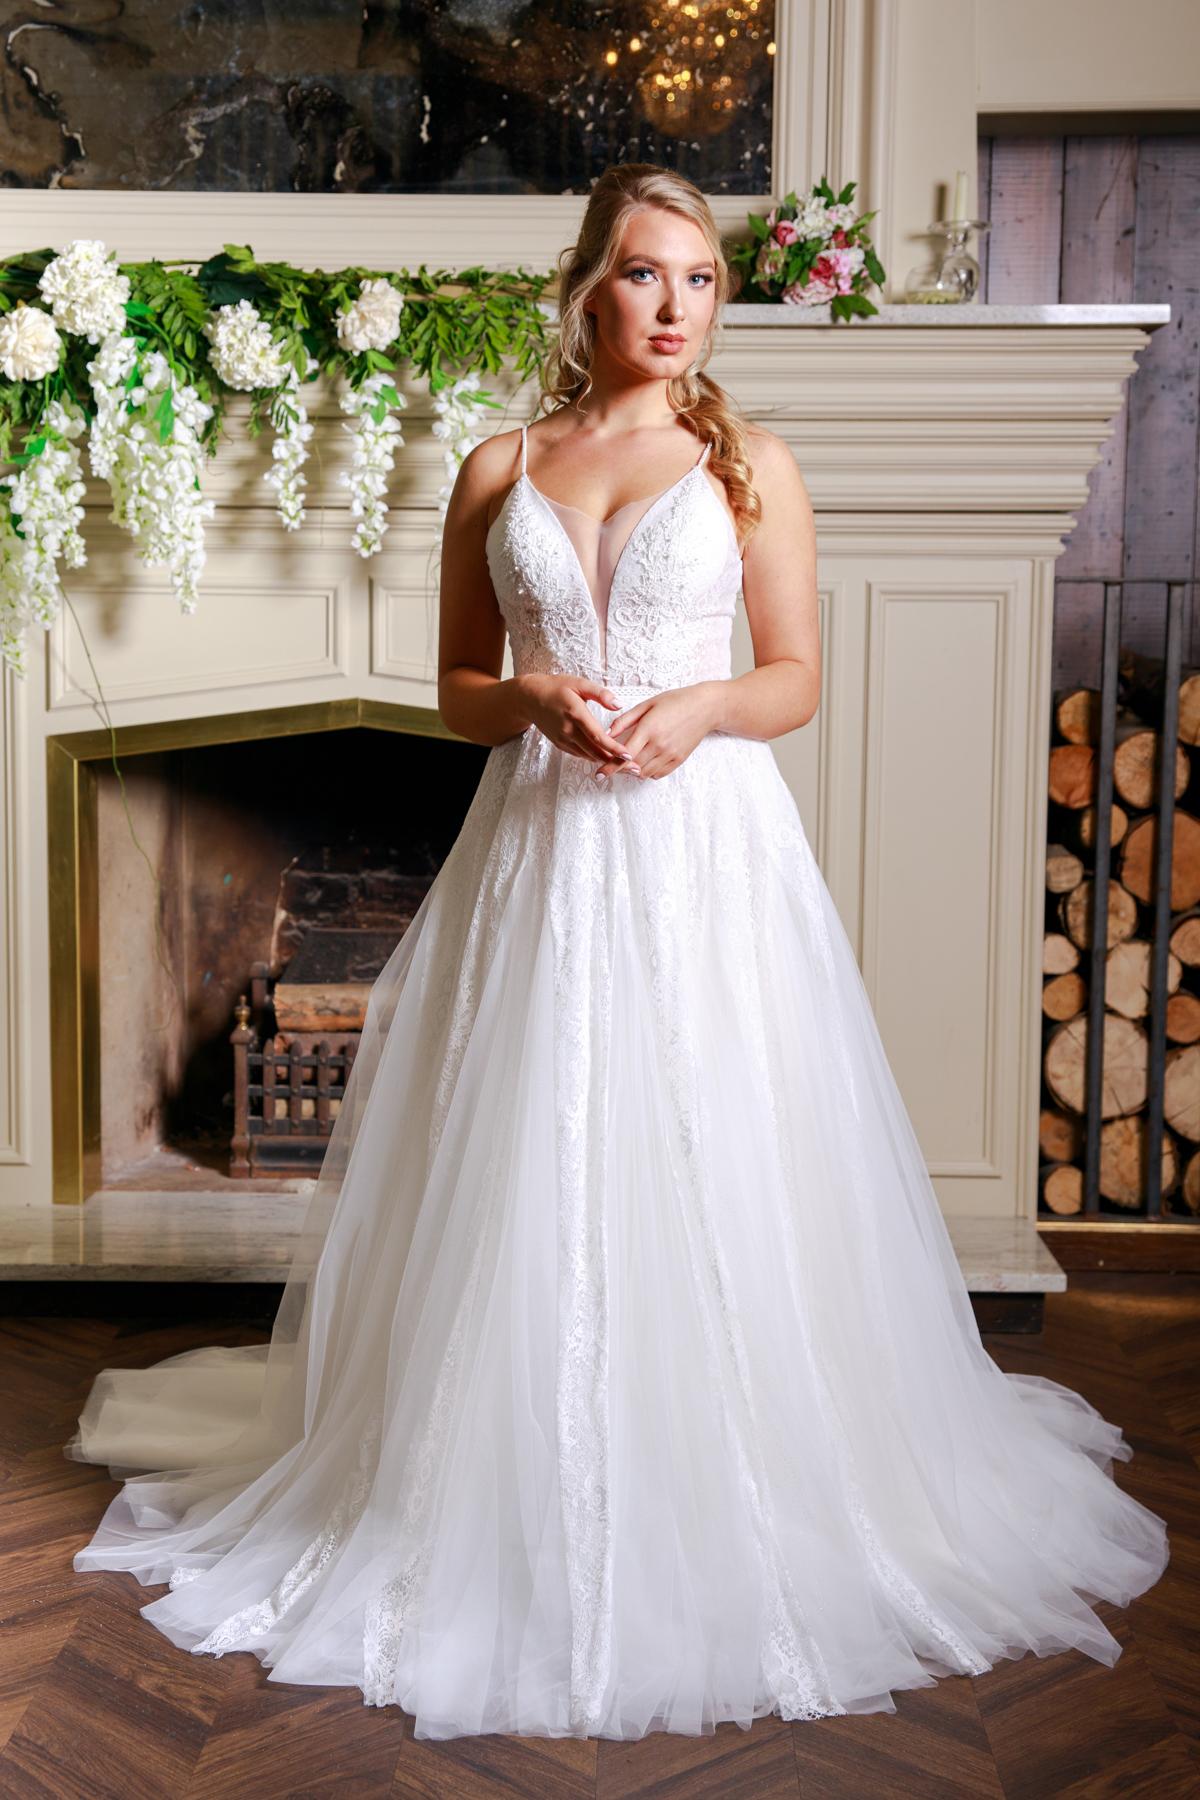 W307-Victoria-Kay-Designer-WJ-Dress-Finder